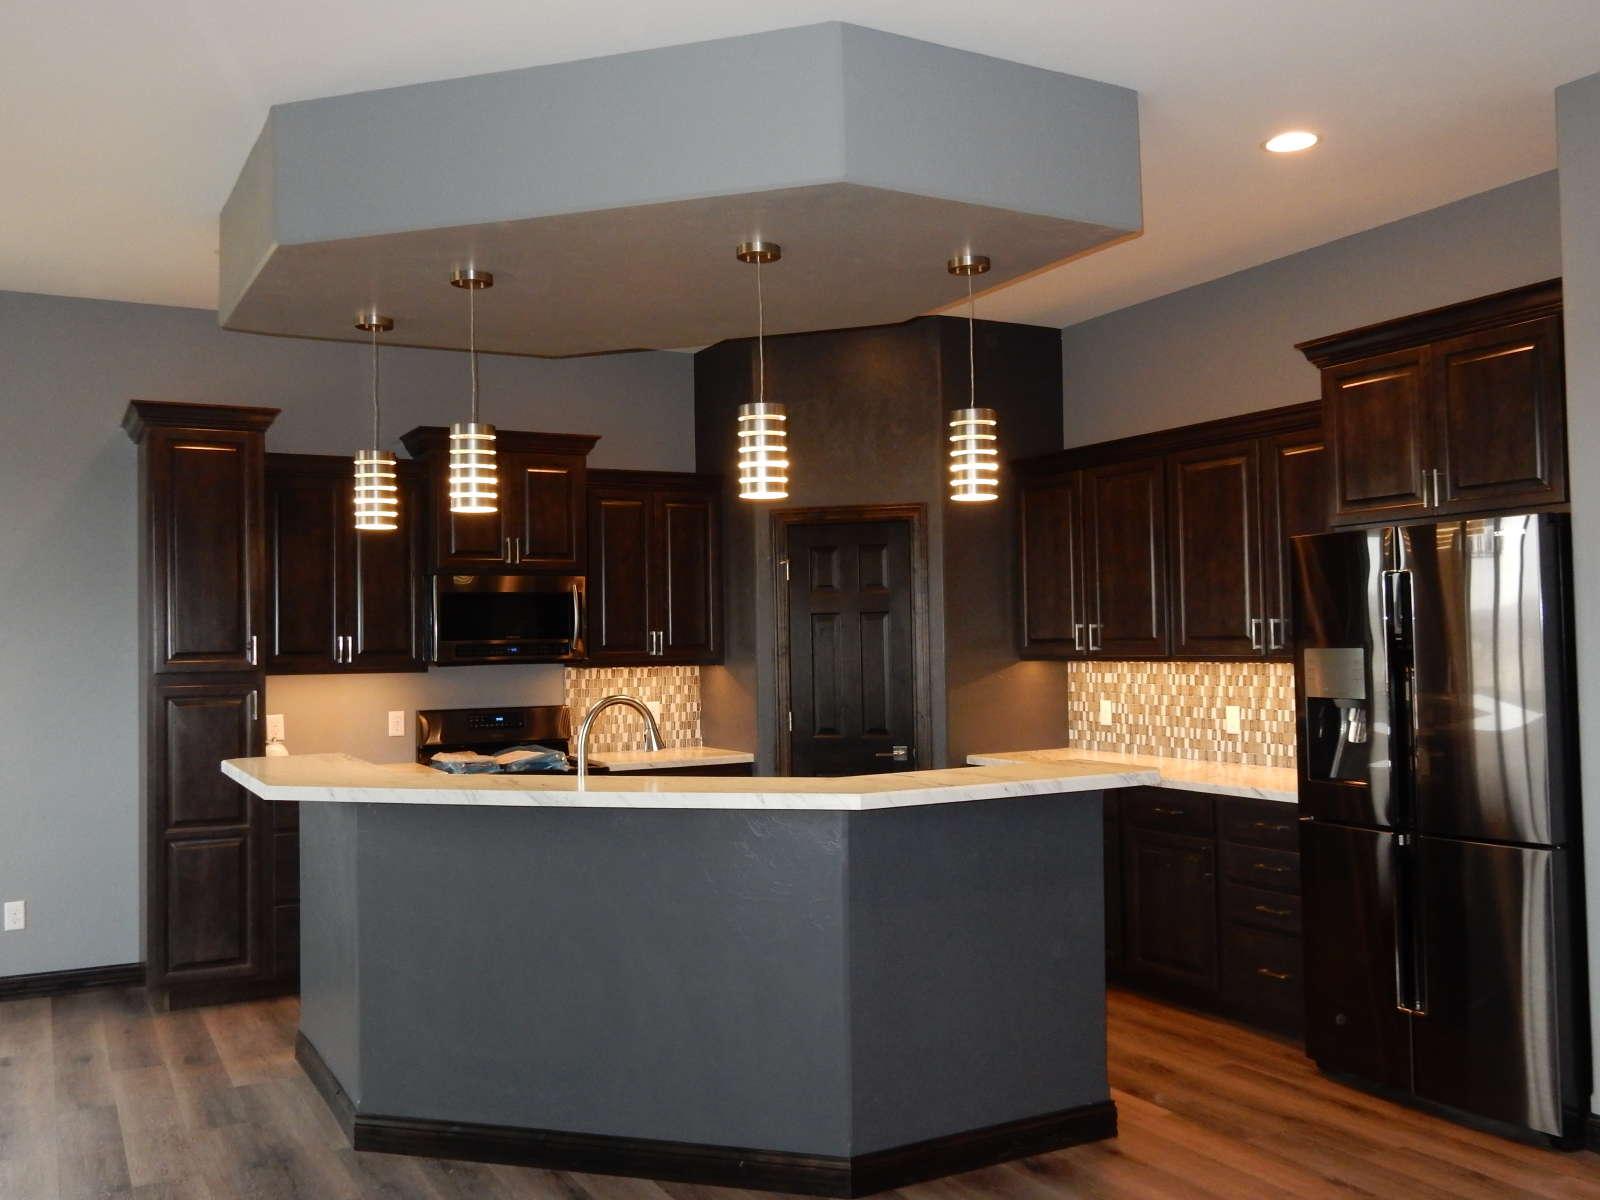 Living spaces apex builders bismarck nd custom homes for Nd home builders